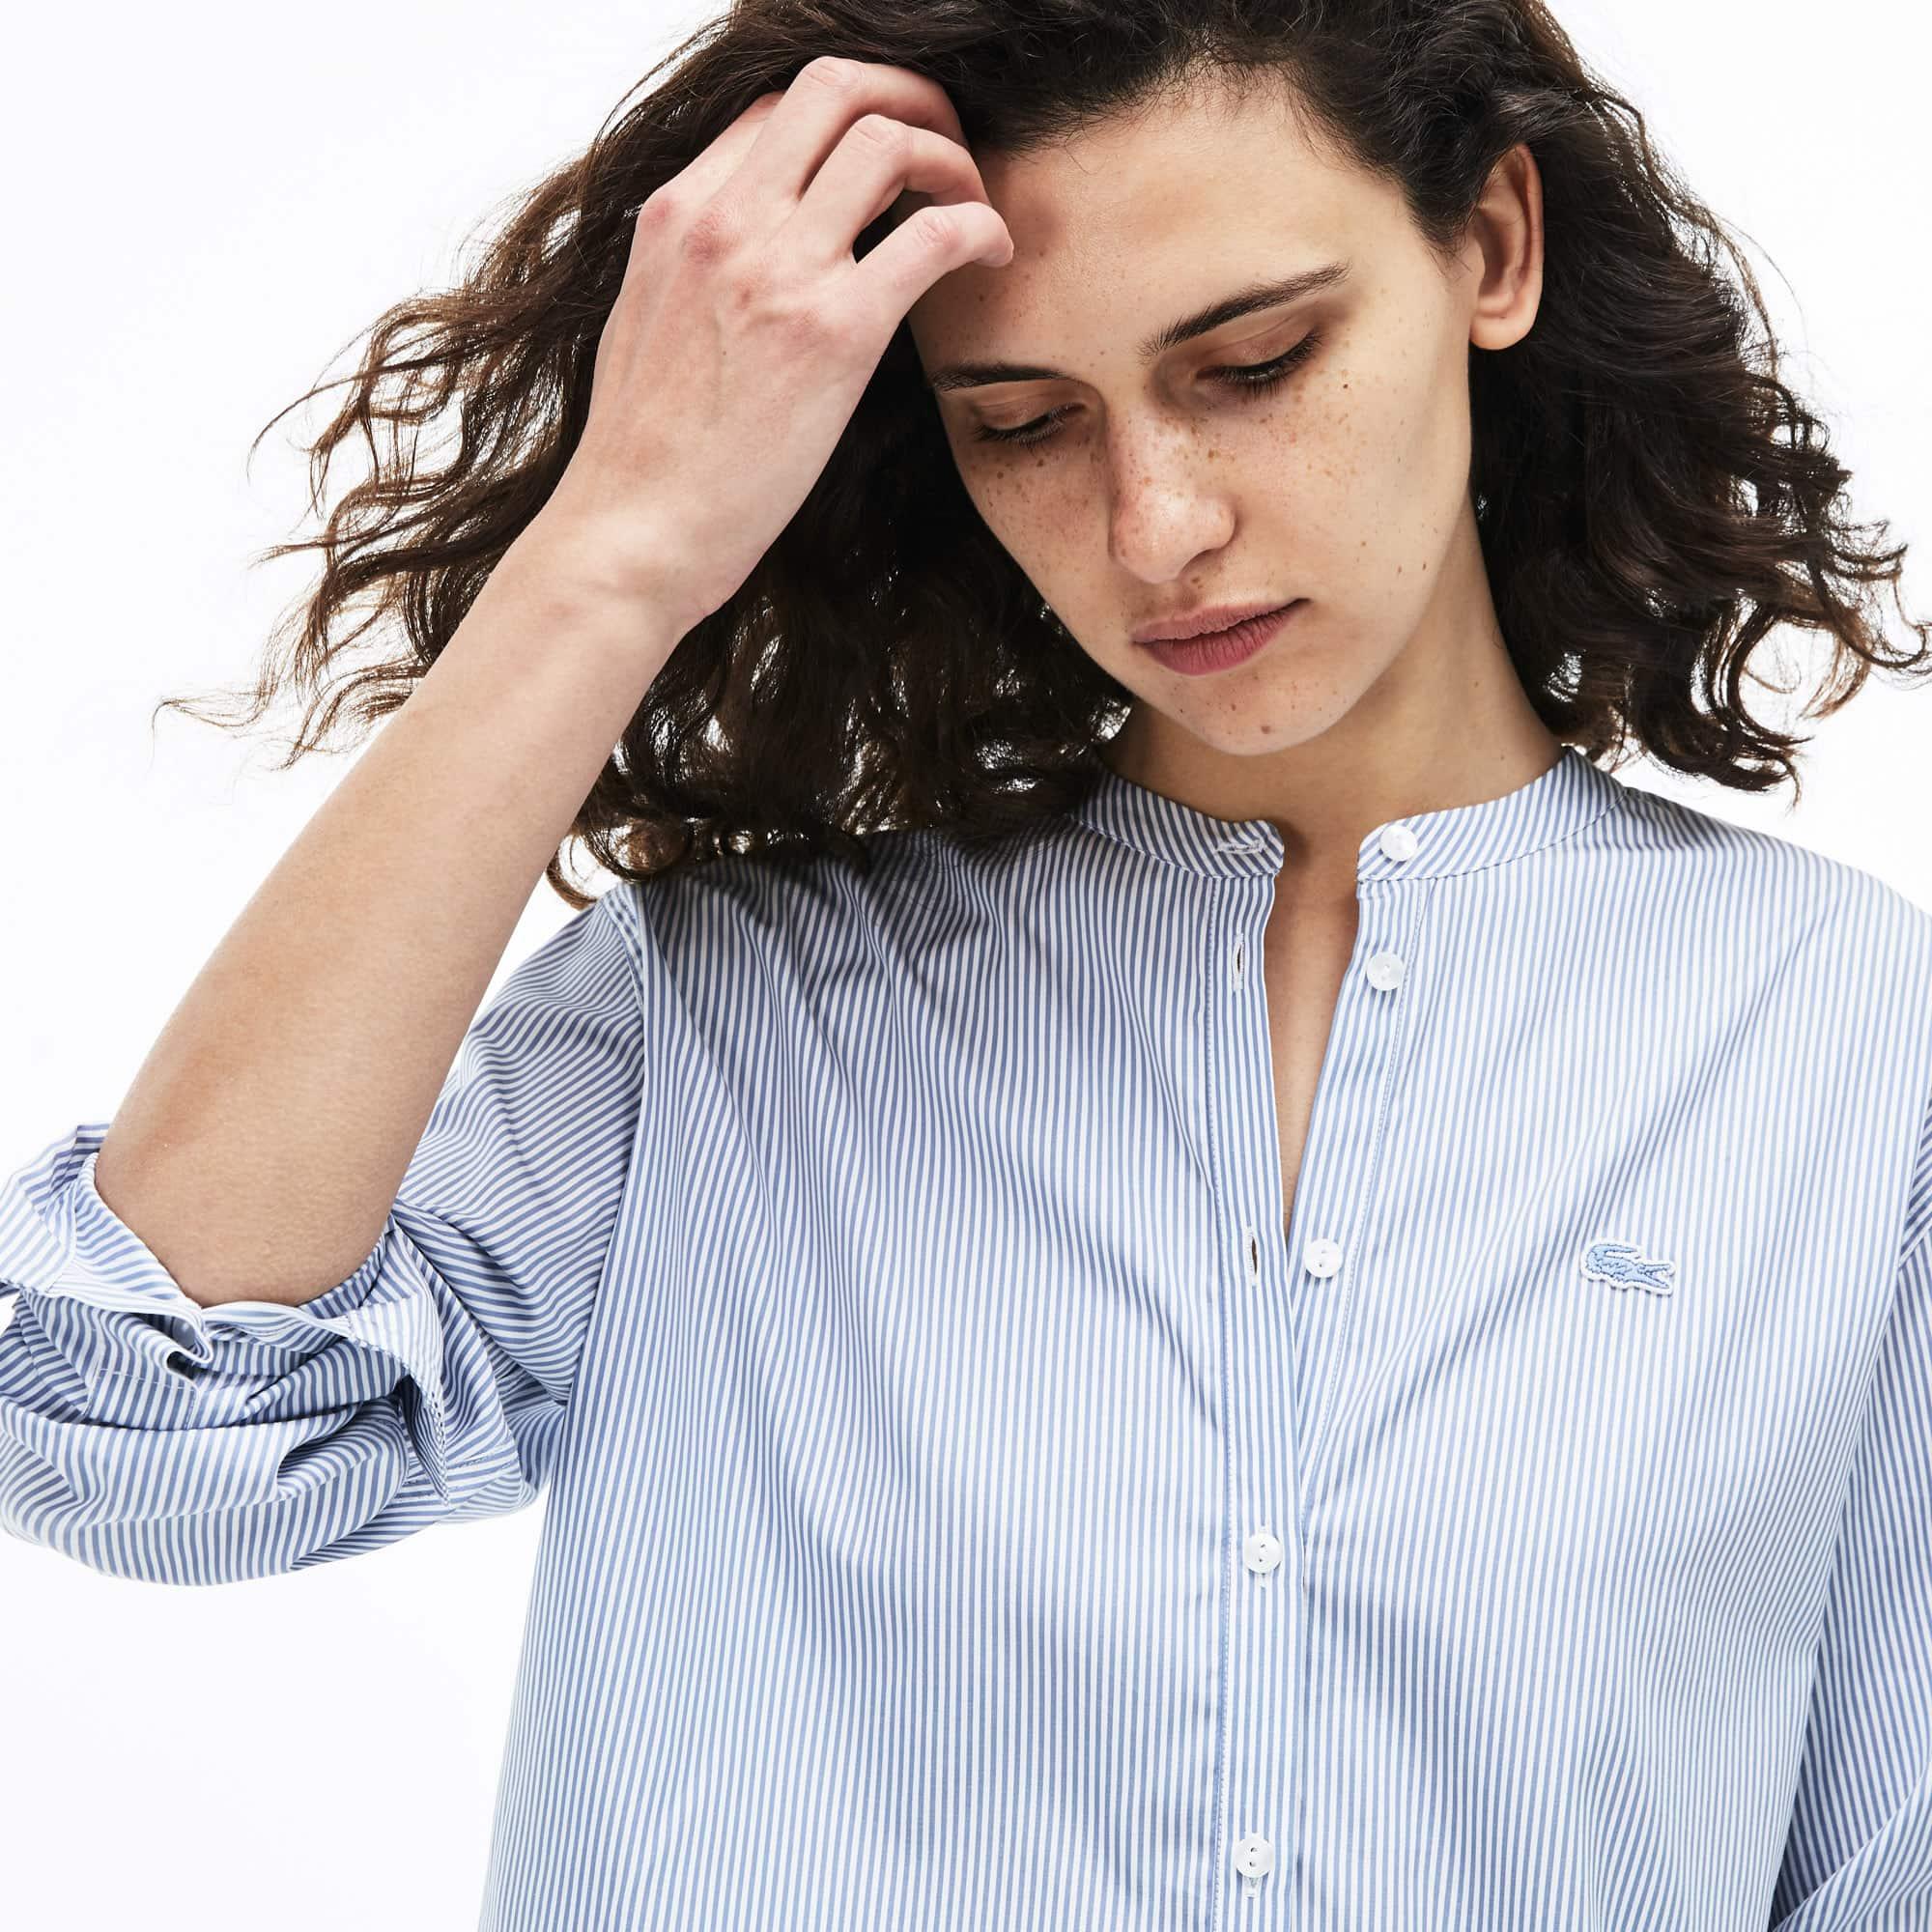 ea6fec5ad3 Women's Loose Fit Mao Collar Striped Cotton Poplin Shirt | LACOSTE